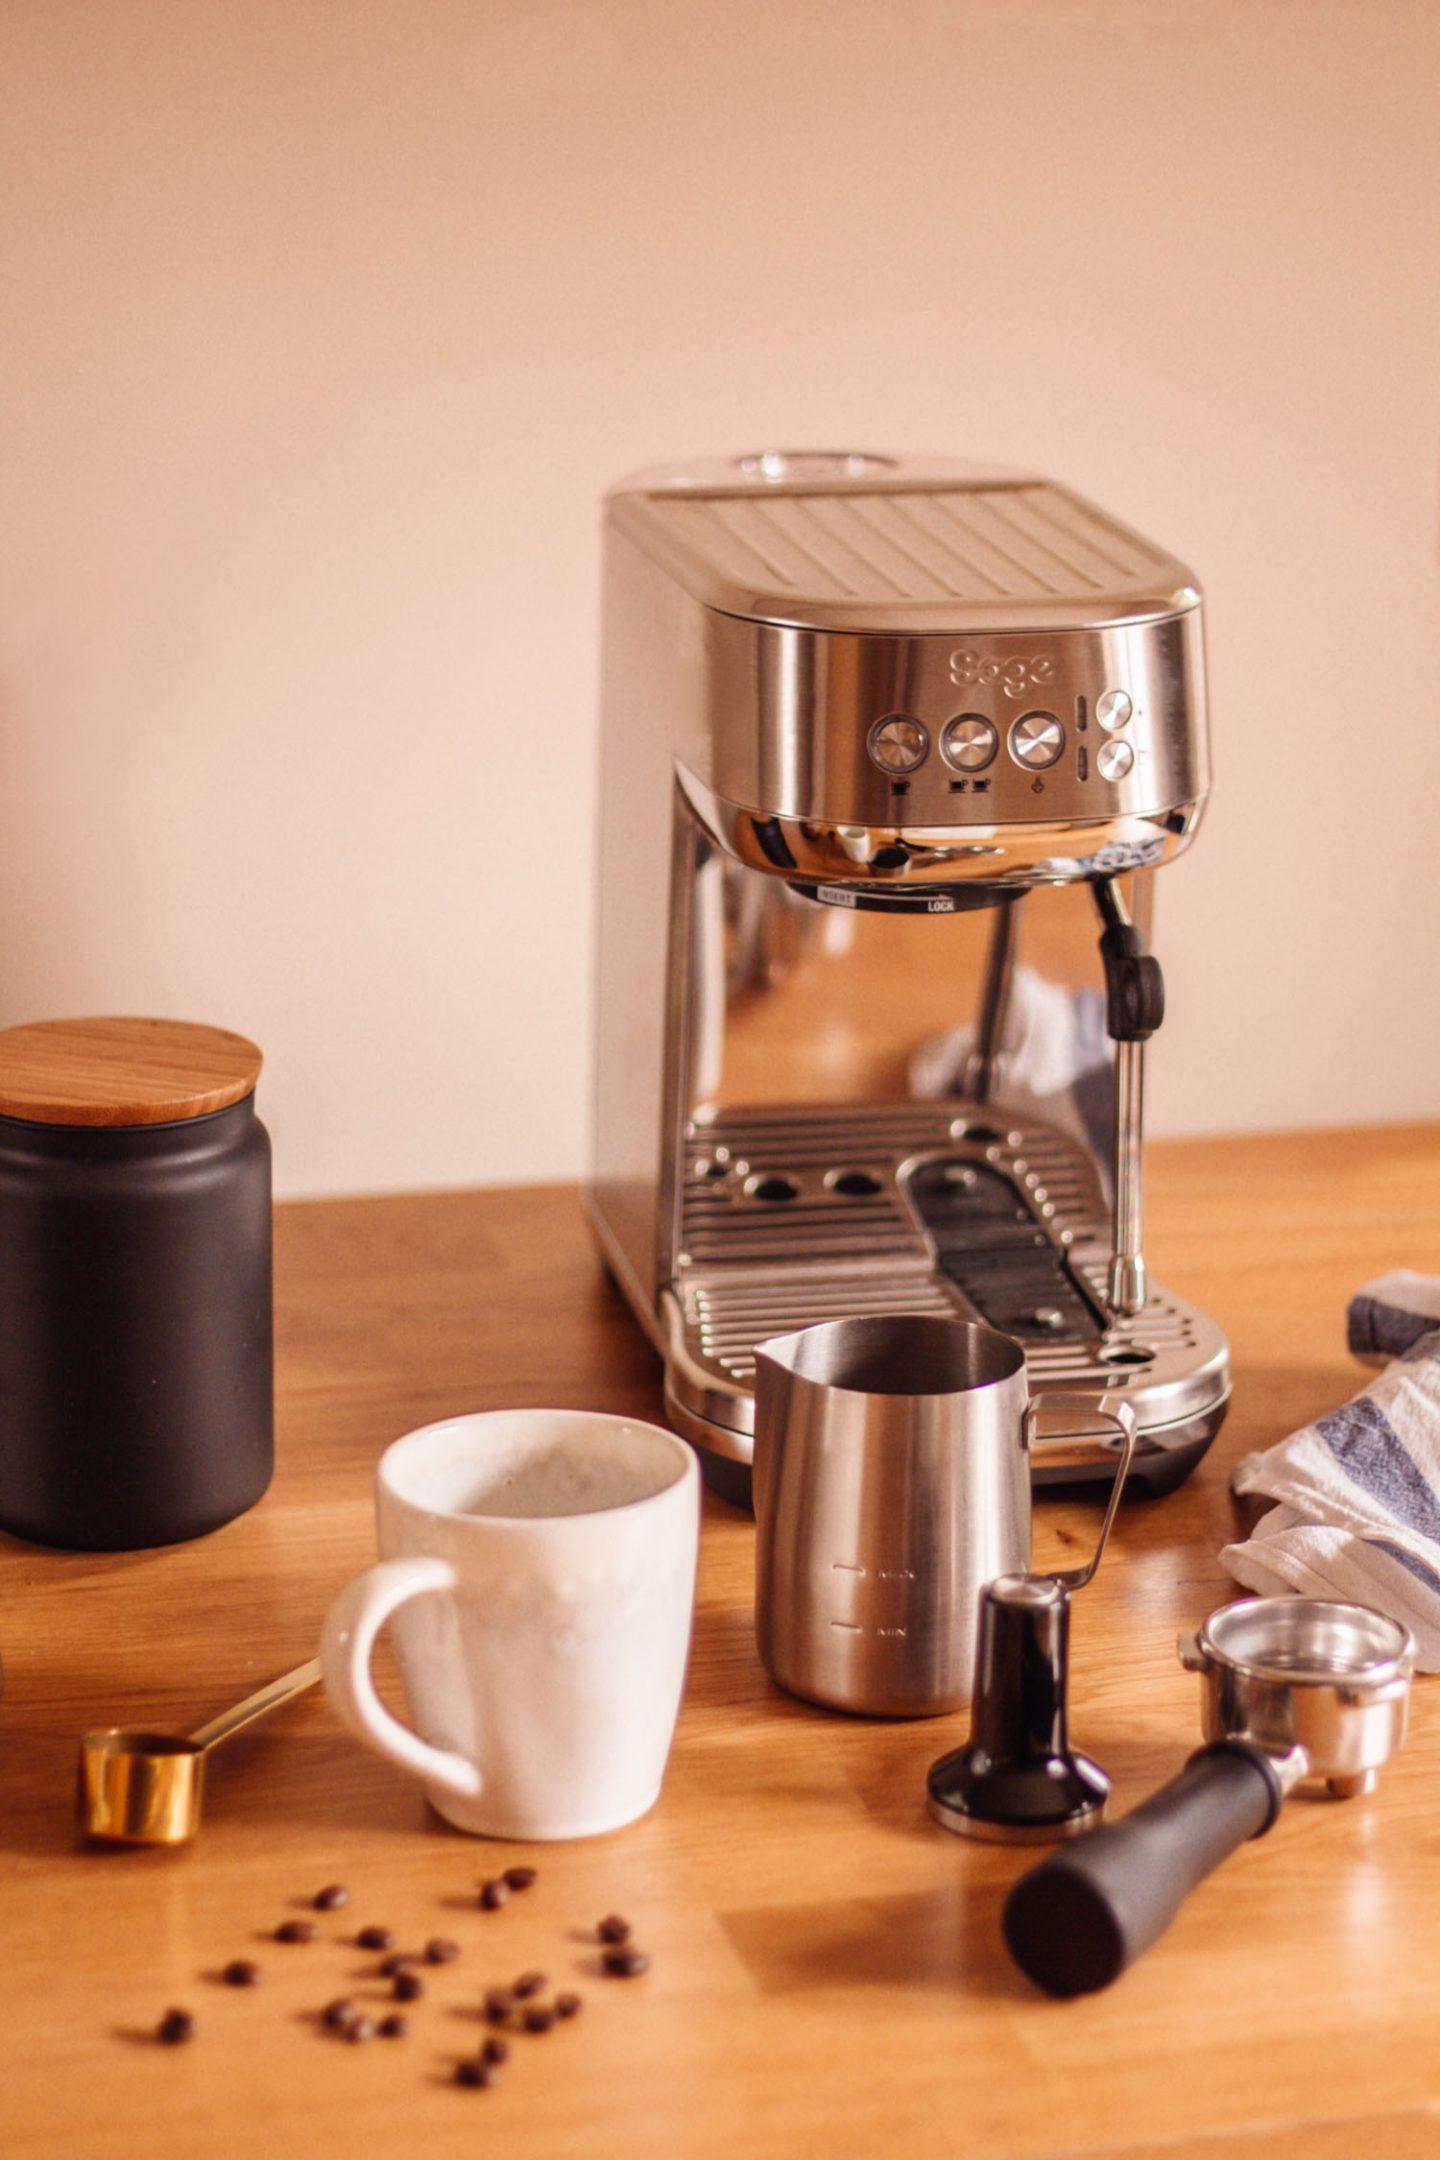 My Favourite Coffee Machine